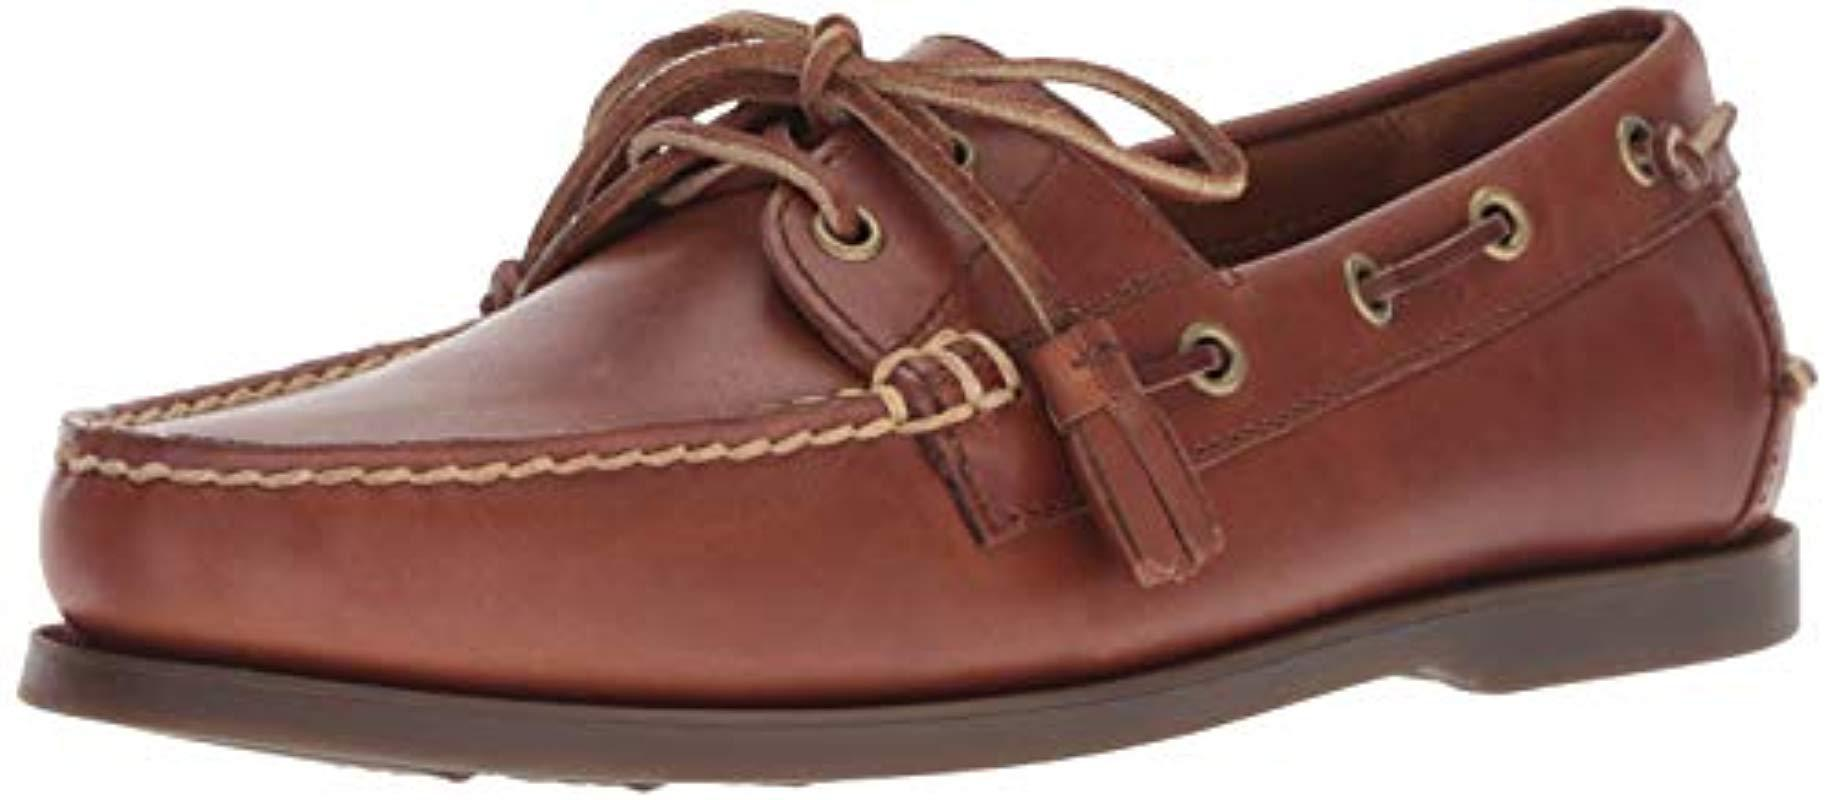 144461bcaf1 Lyst - Polo Ralph Lauren Merton Boat Shoe for Men